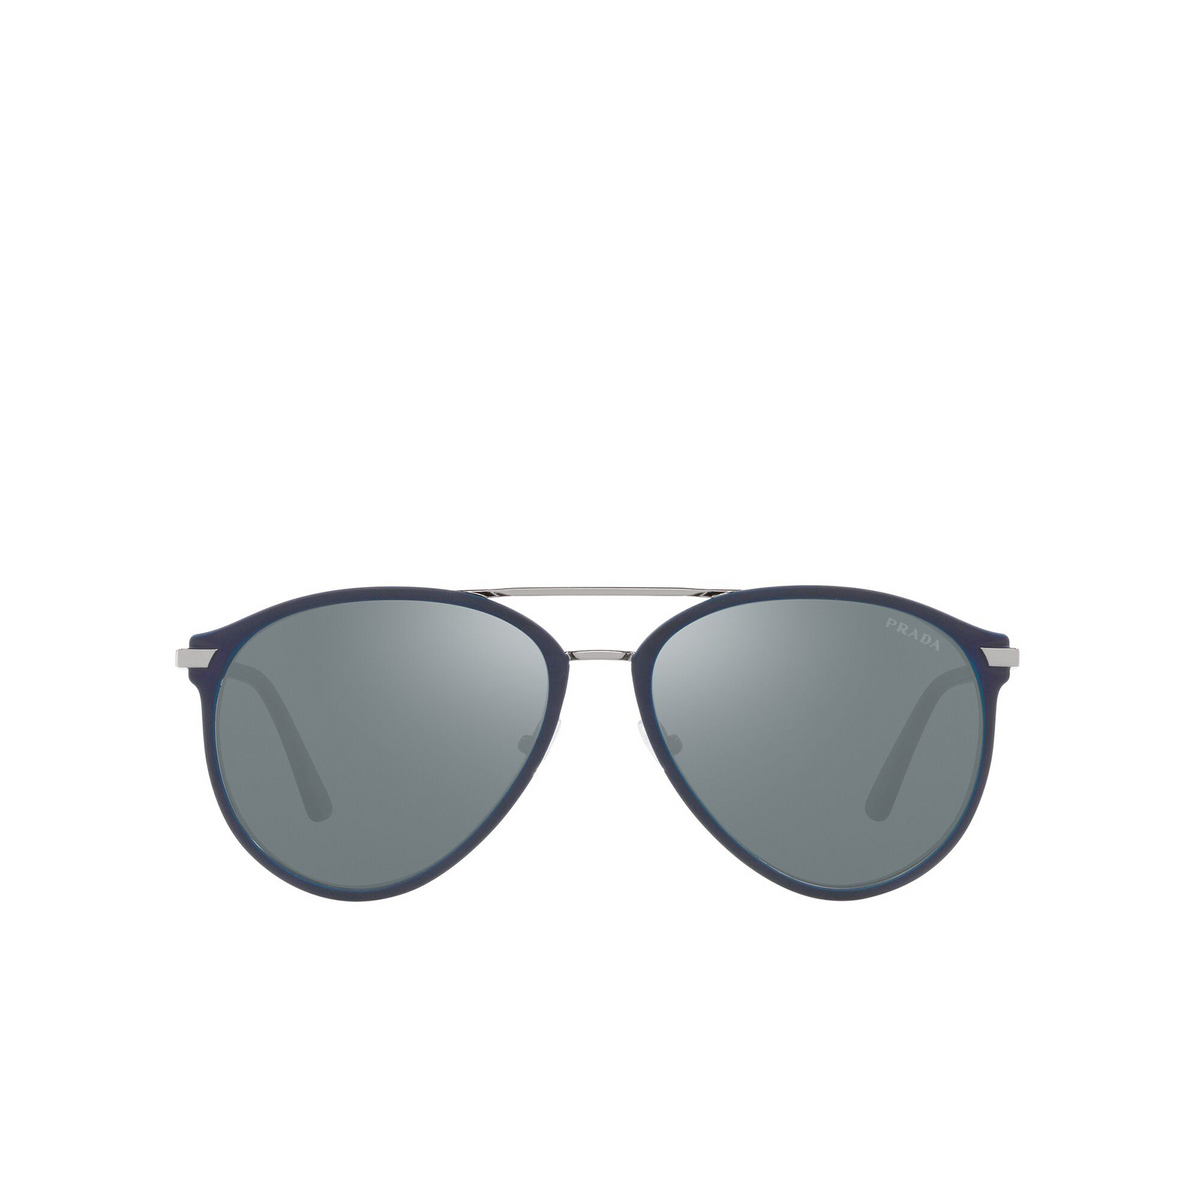 Prada® Aviator Sunglasses: PR 51WS color Matte Baltic / Gunmetal 02N01A - front view.